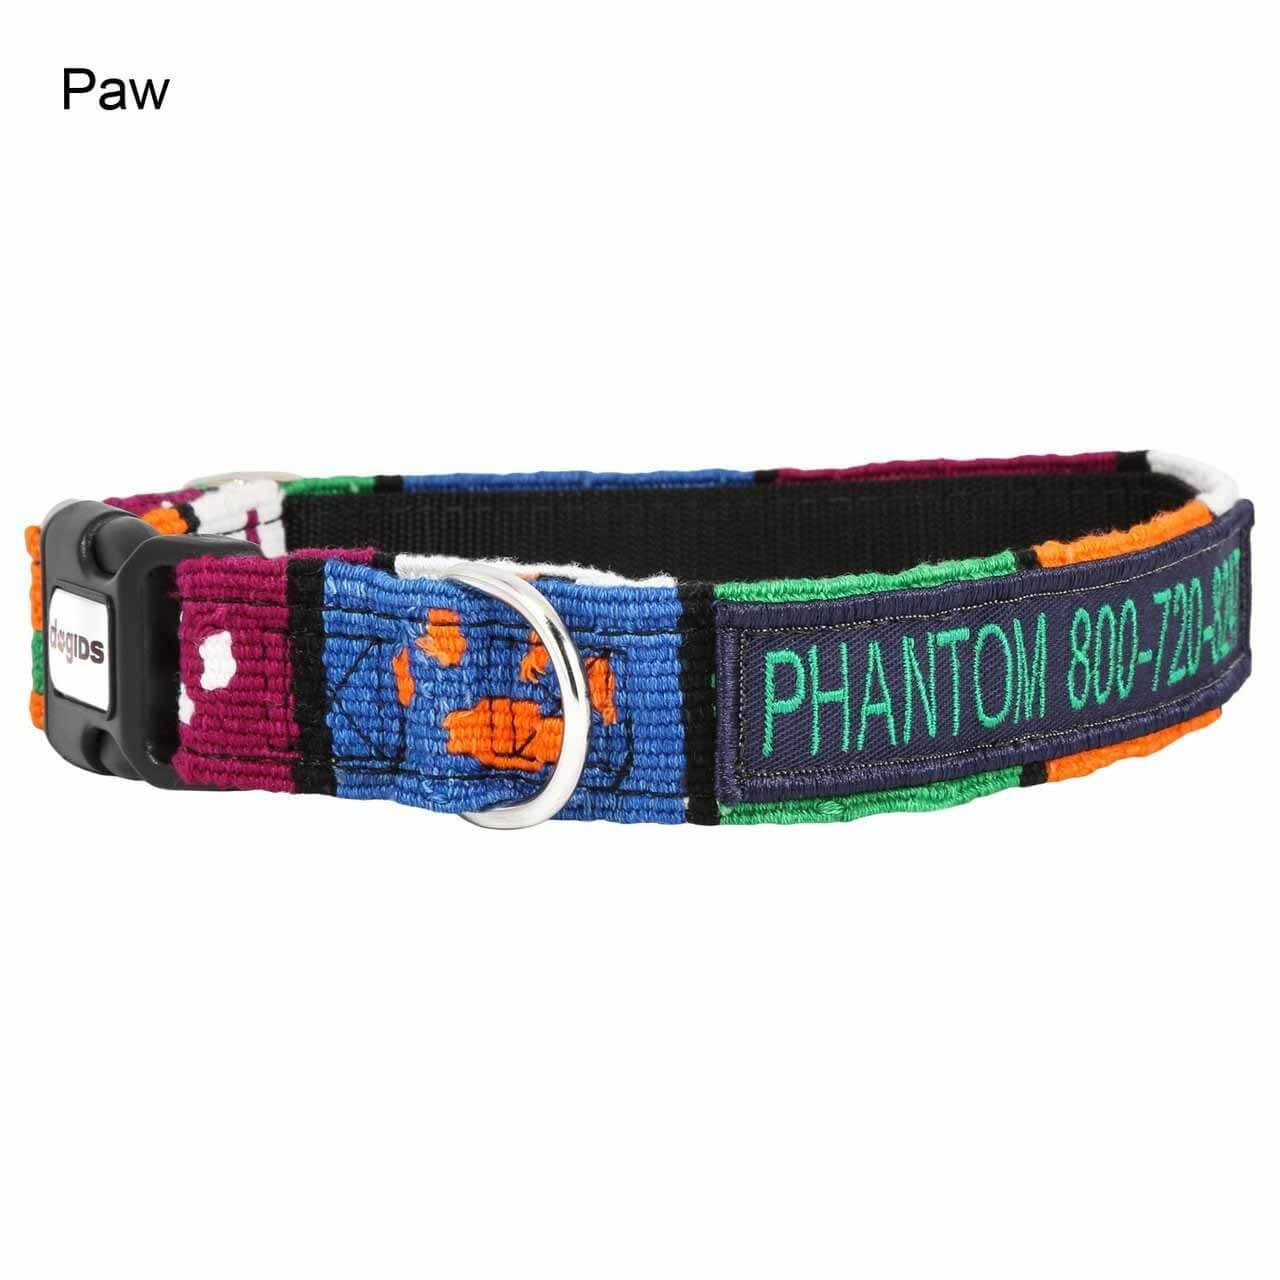 Embroidered Maya Personalized Dog Collar Paw